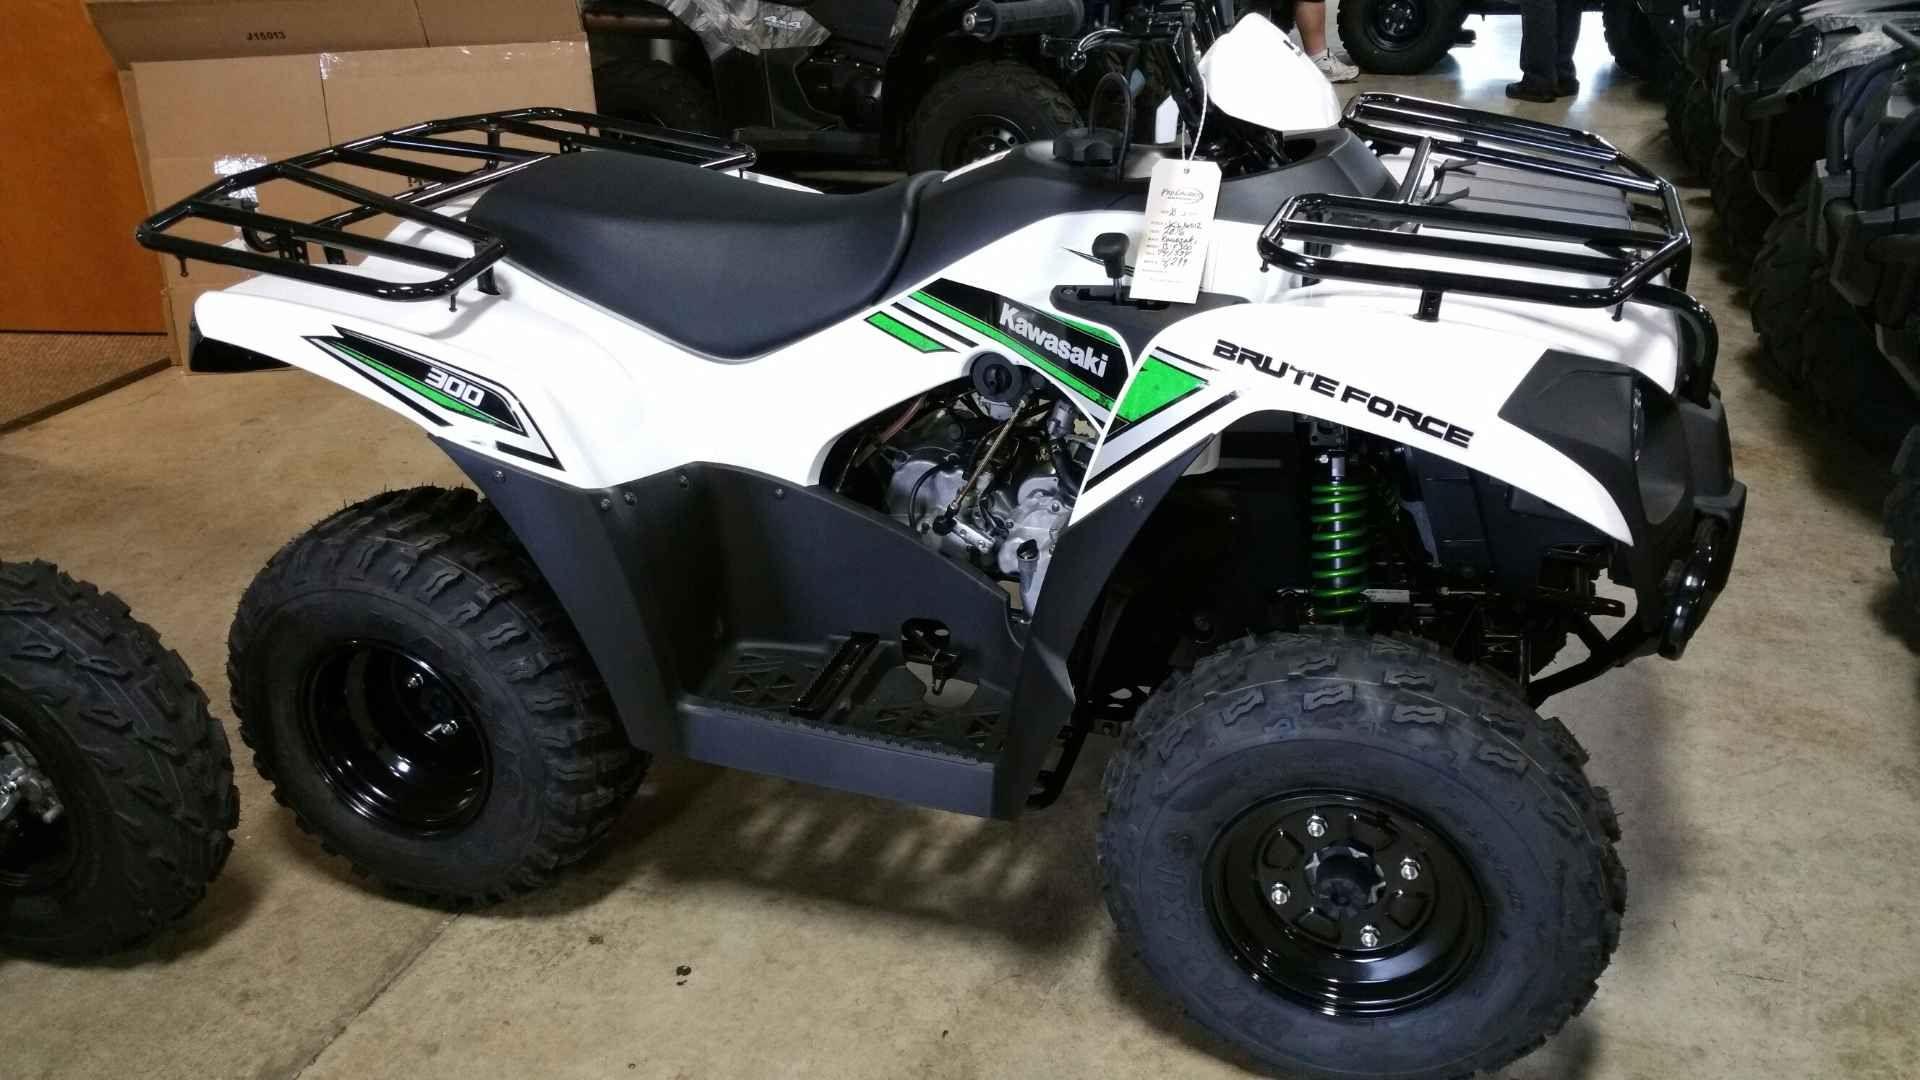 New 2016 Kawasaki Brute Force® 300 ATVs For Sale in Ohio. The Brute